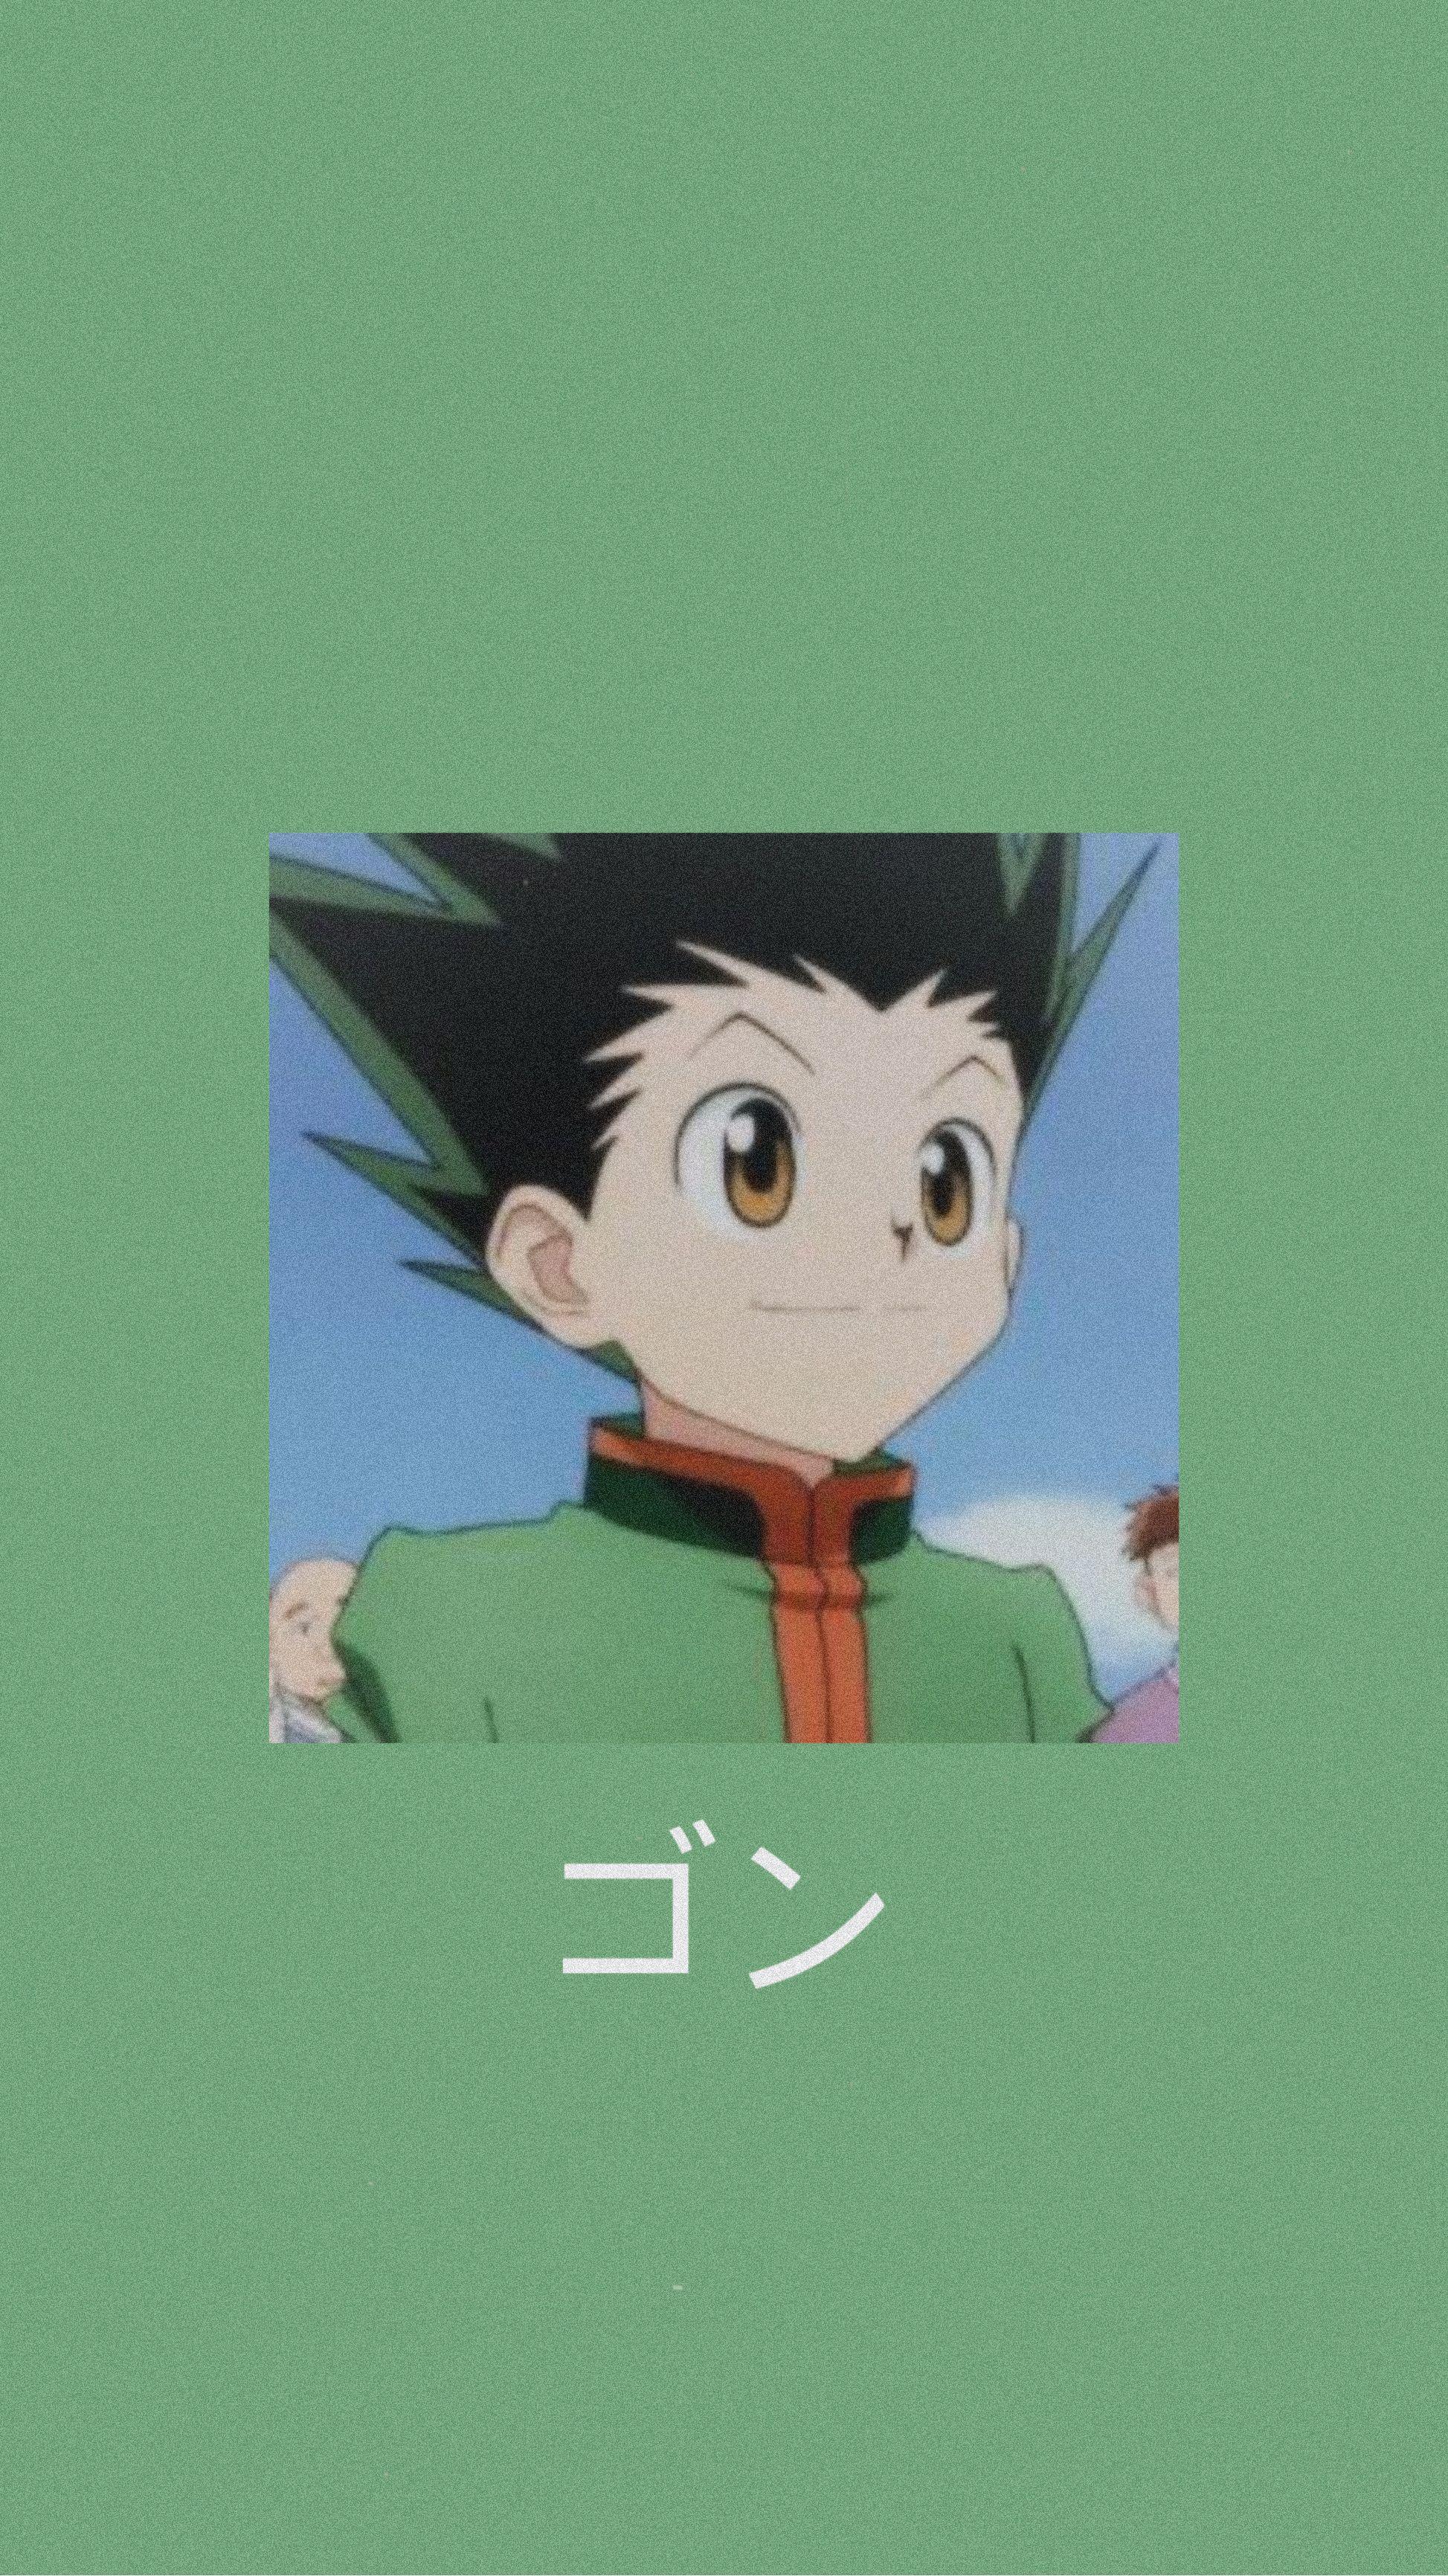 Pin By Alyssa Velez On W A L L P A P E R S In 2020 Anime Wallpaper Cute Anime Wallpaper Anime Wallpaper Iphone